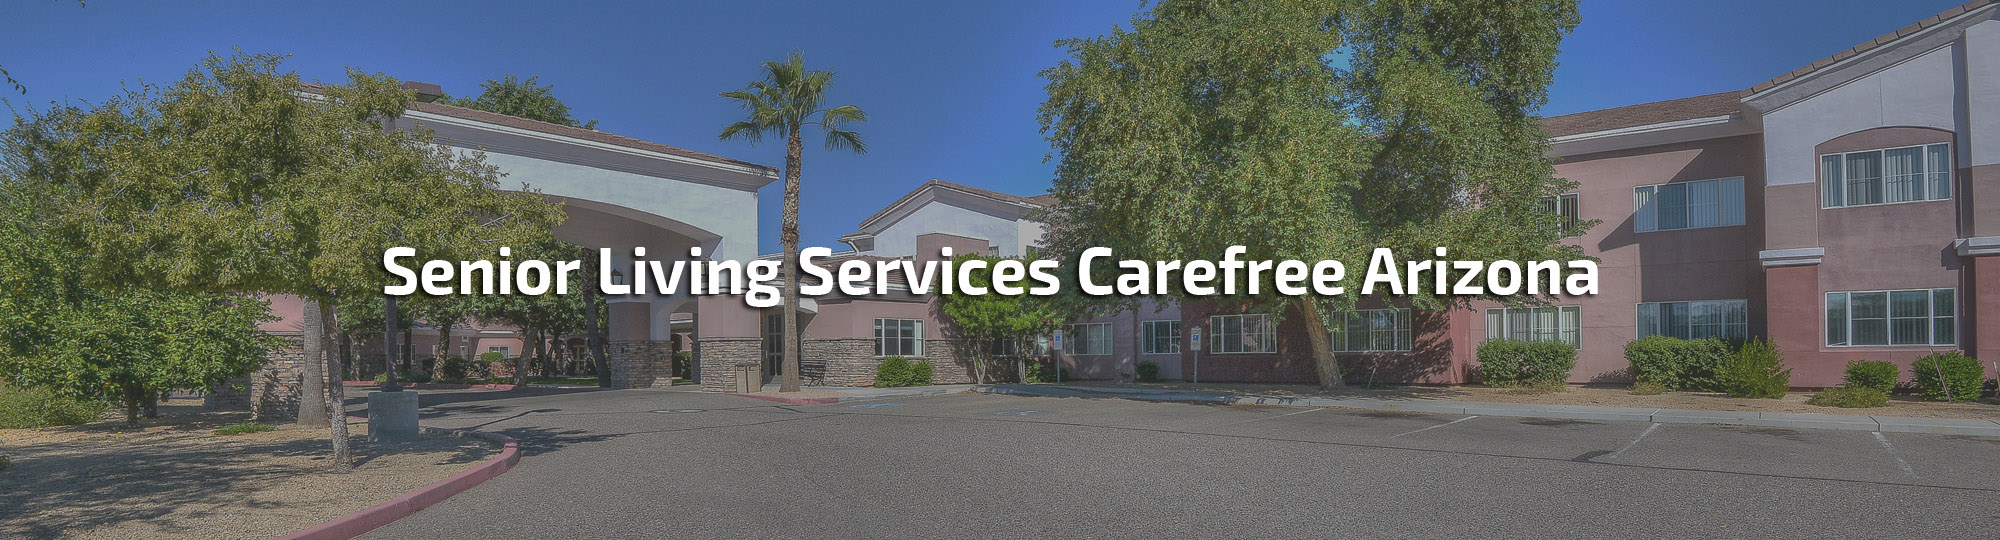 Senior Living Services Carefree Arizona